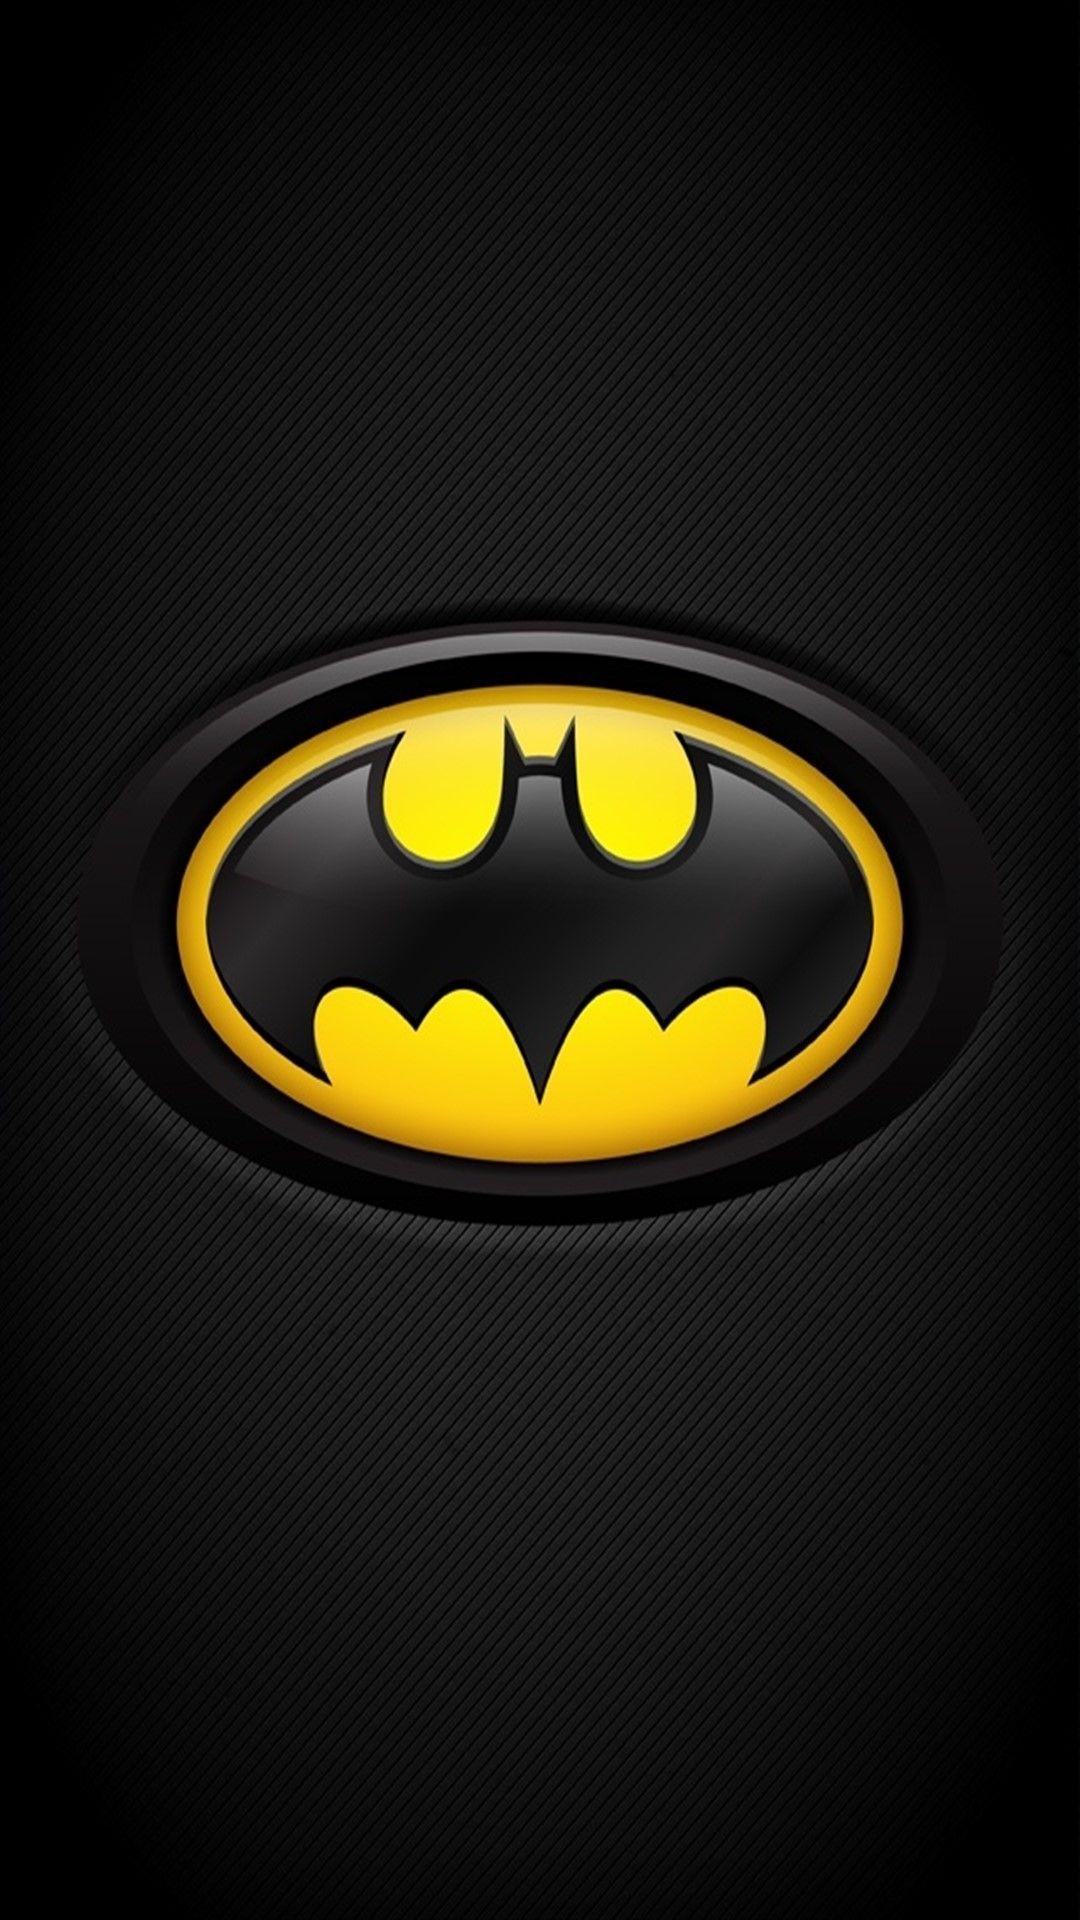 Batman Iphone 6 Plus Wallpapers Top Free Batman Iphone 6 Plus